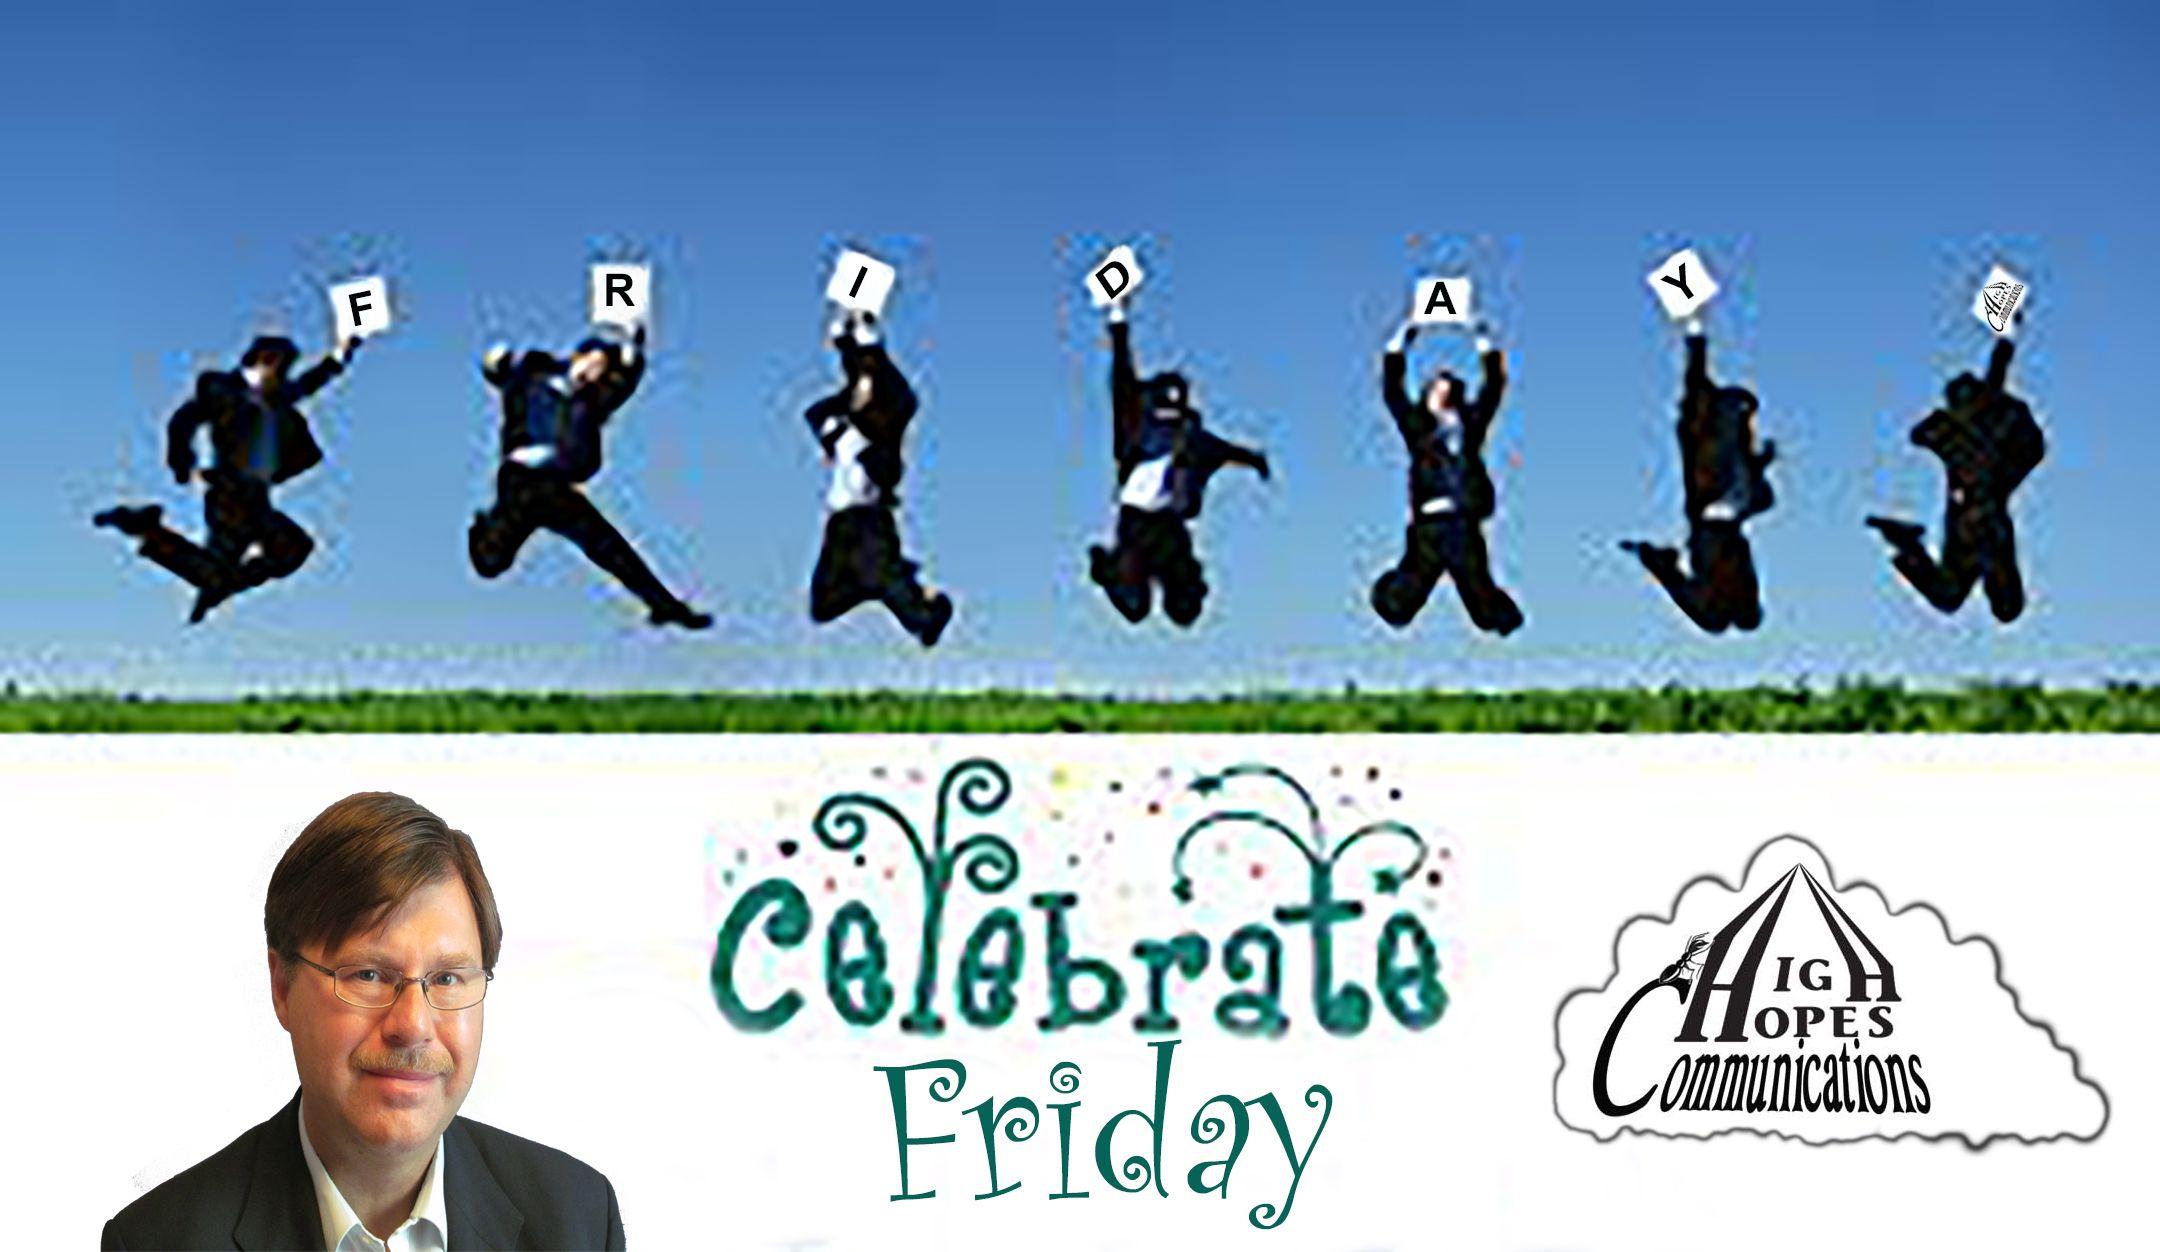 Celebrate Friday www.highhopescommunications.ca